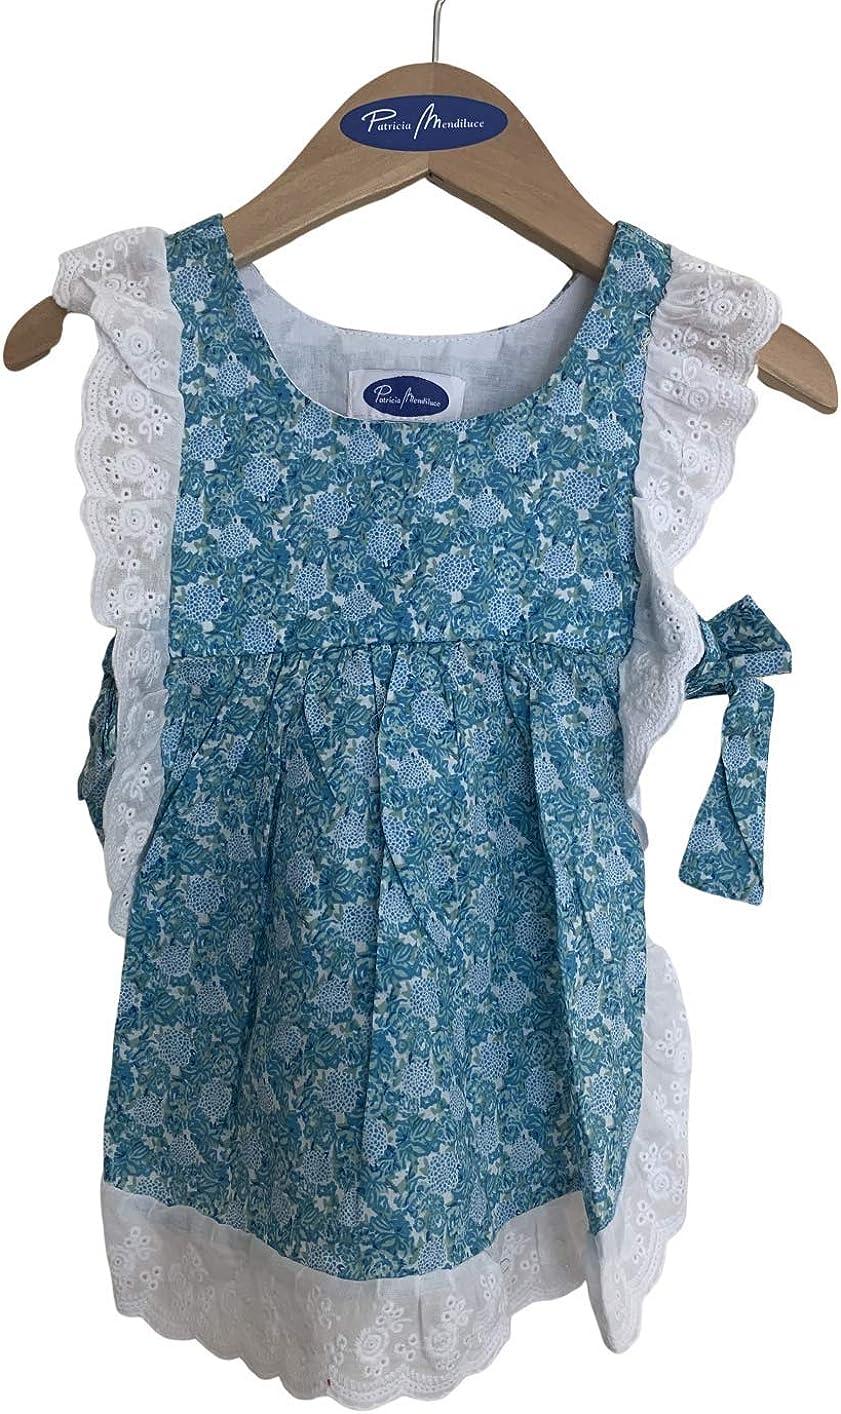 Conjunto Bebe Vestido Patricia Mendiluce Braguita volantitos Flores peque/ñas Azules